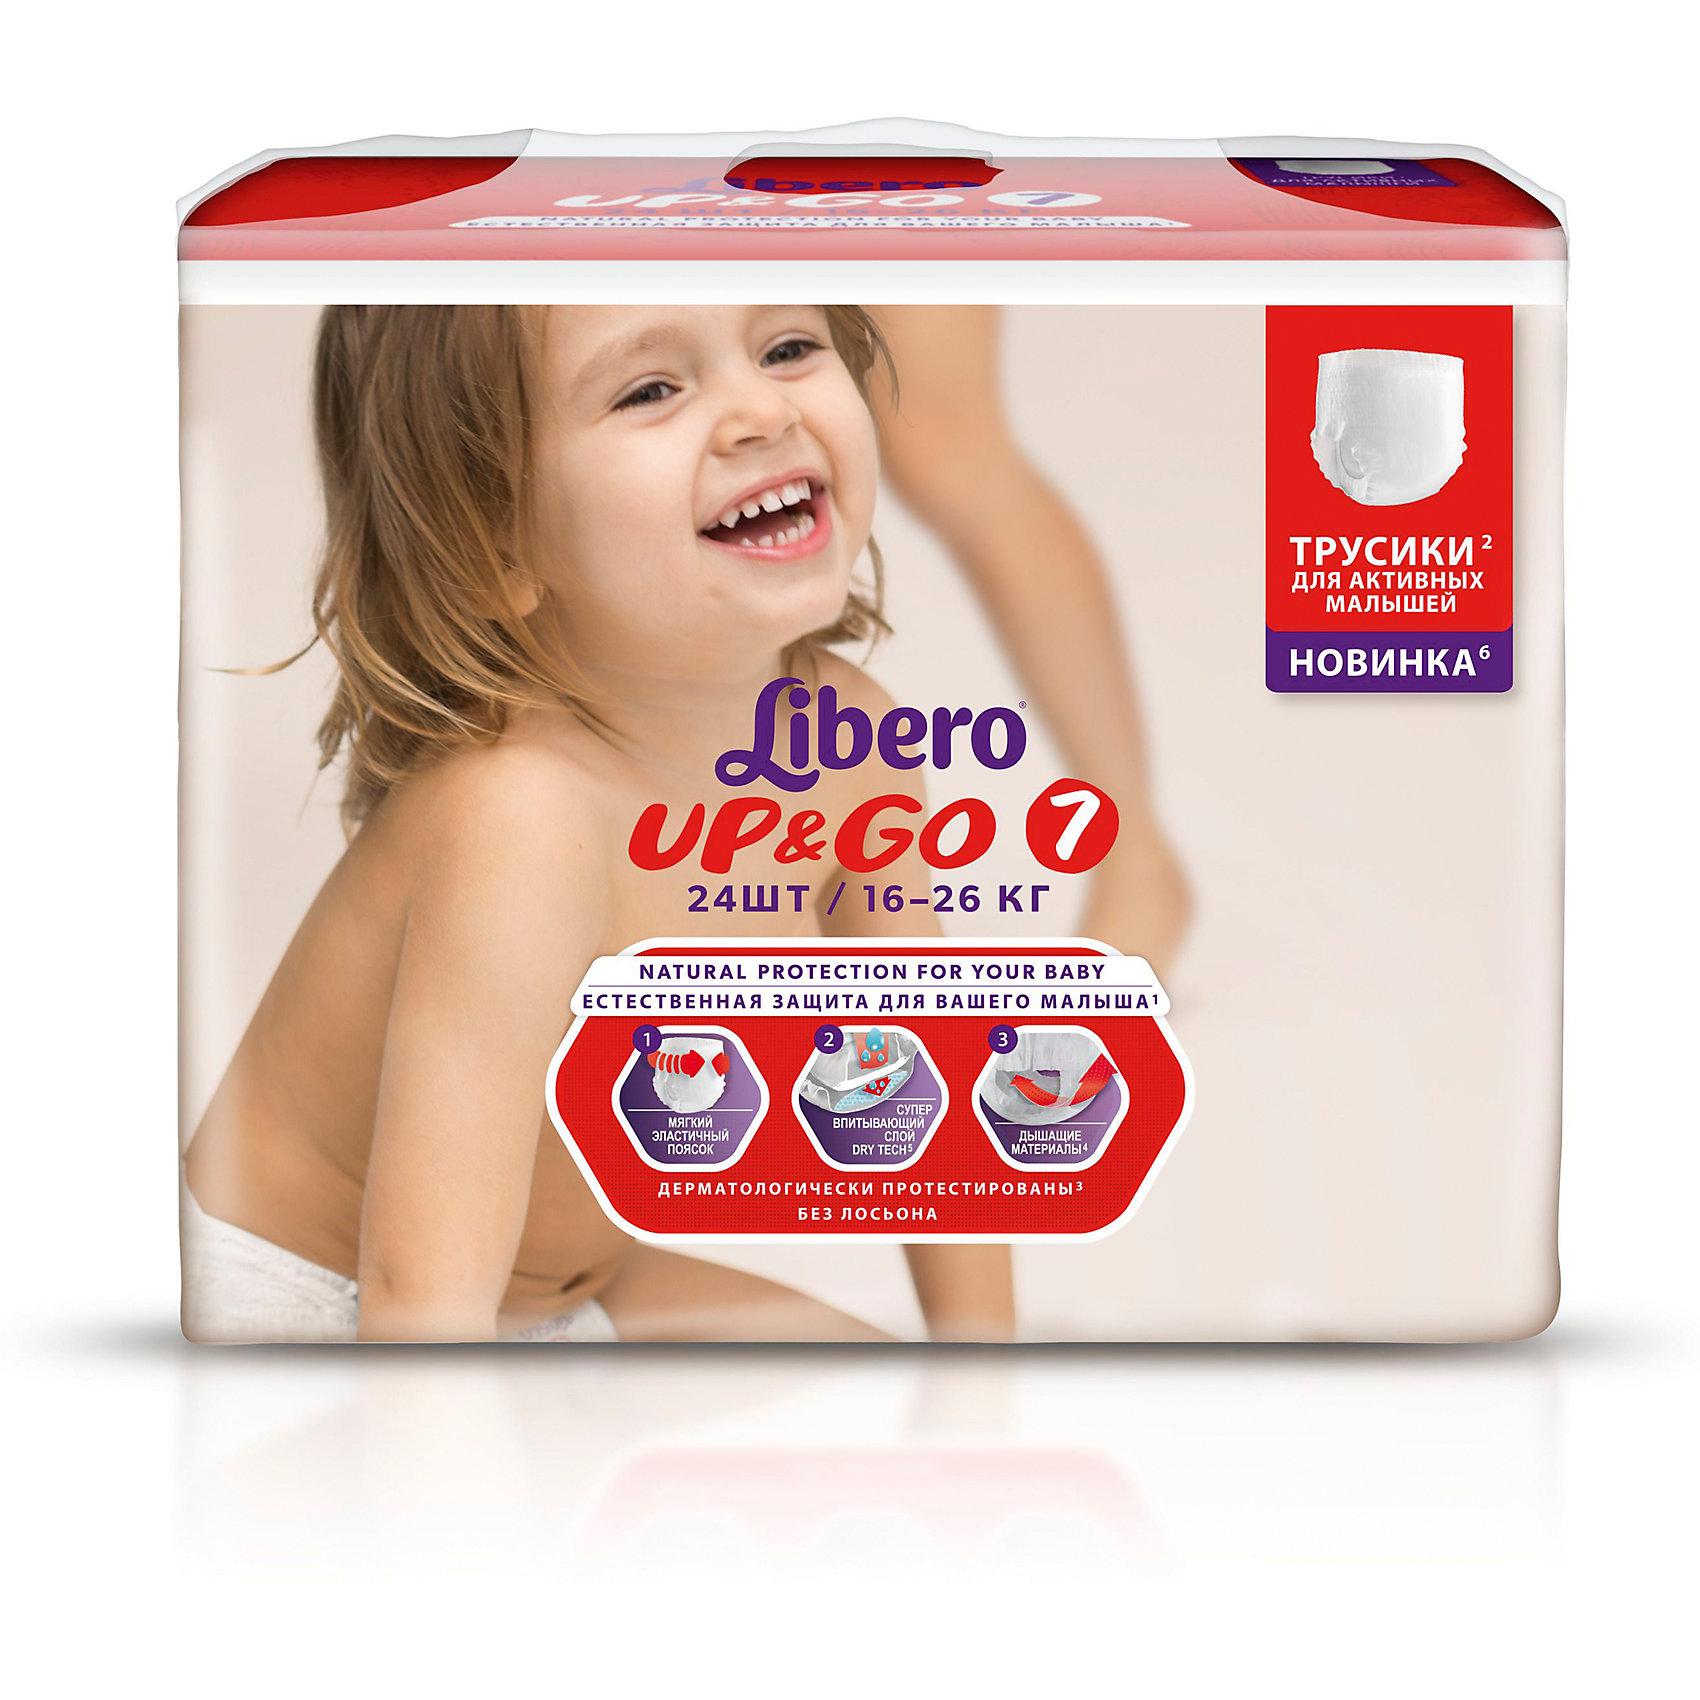 Трусики UpGo, XL Plus 16-26 кг (7), 24 шт., Libero